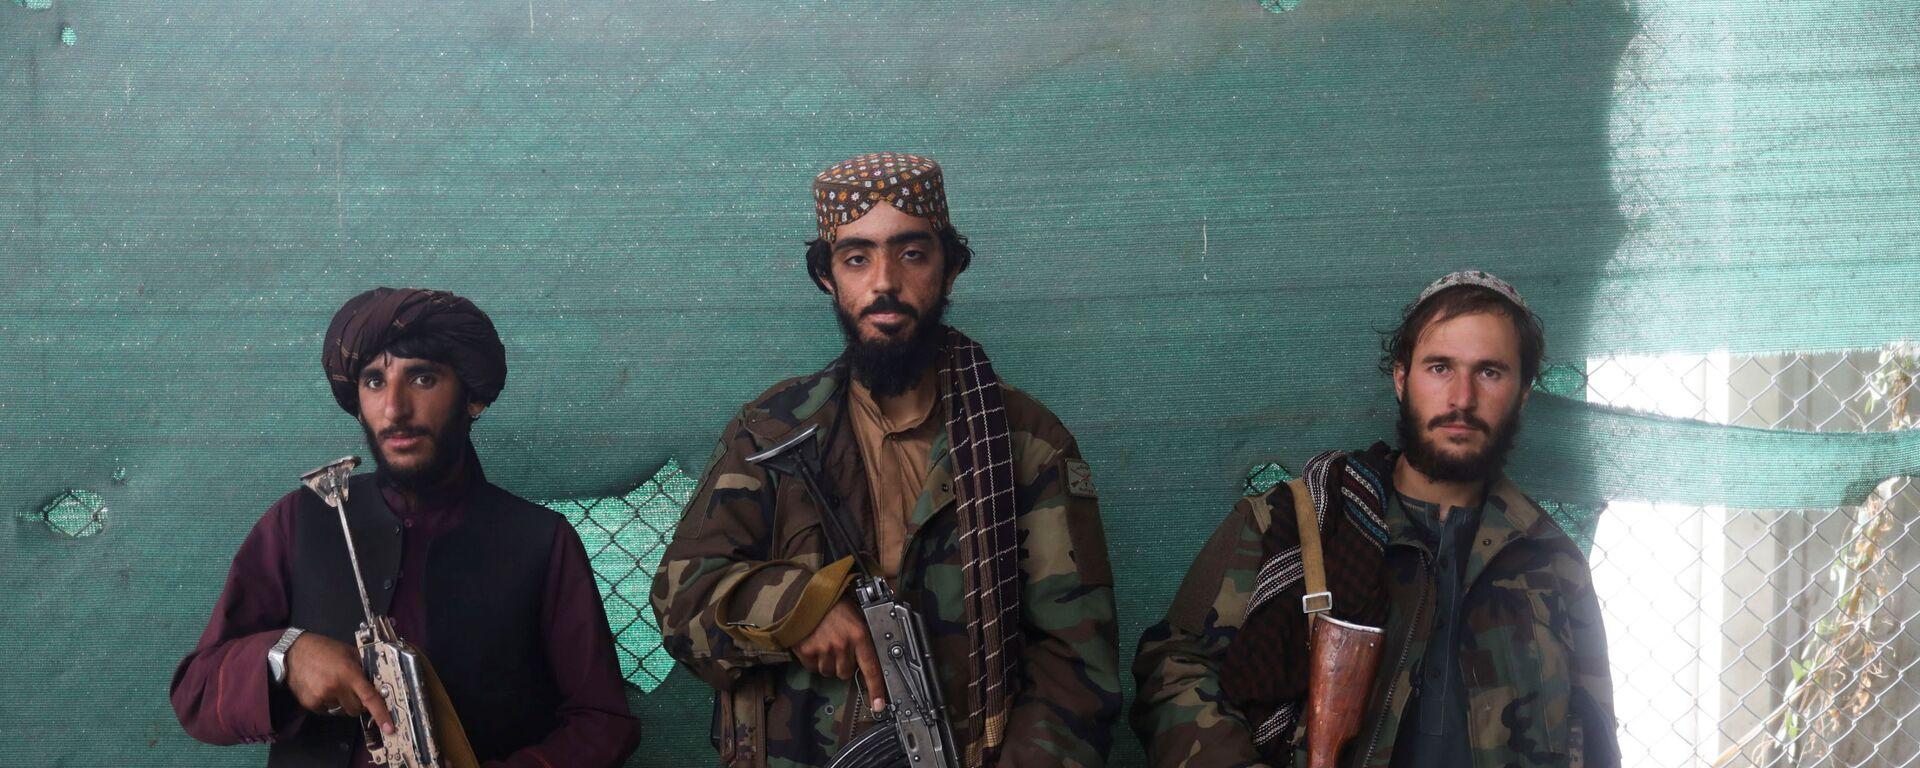 Боевики Талибана* с оружием на авиабазе Баграм в Парване, Афганистан - Sputnik Тоҷикистон, 1920, 10.10.2021